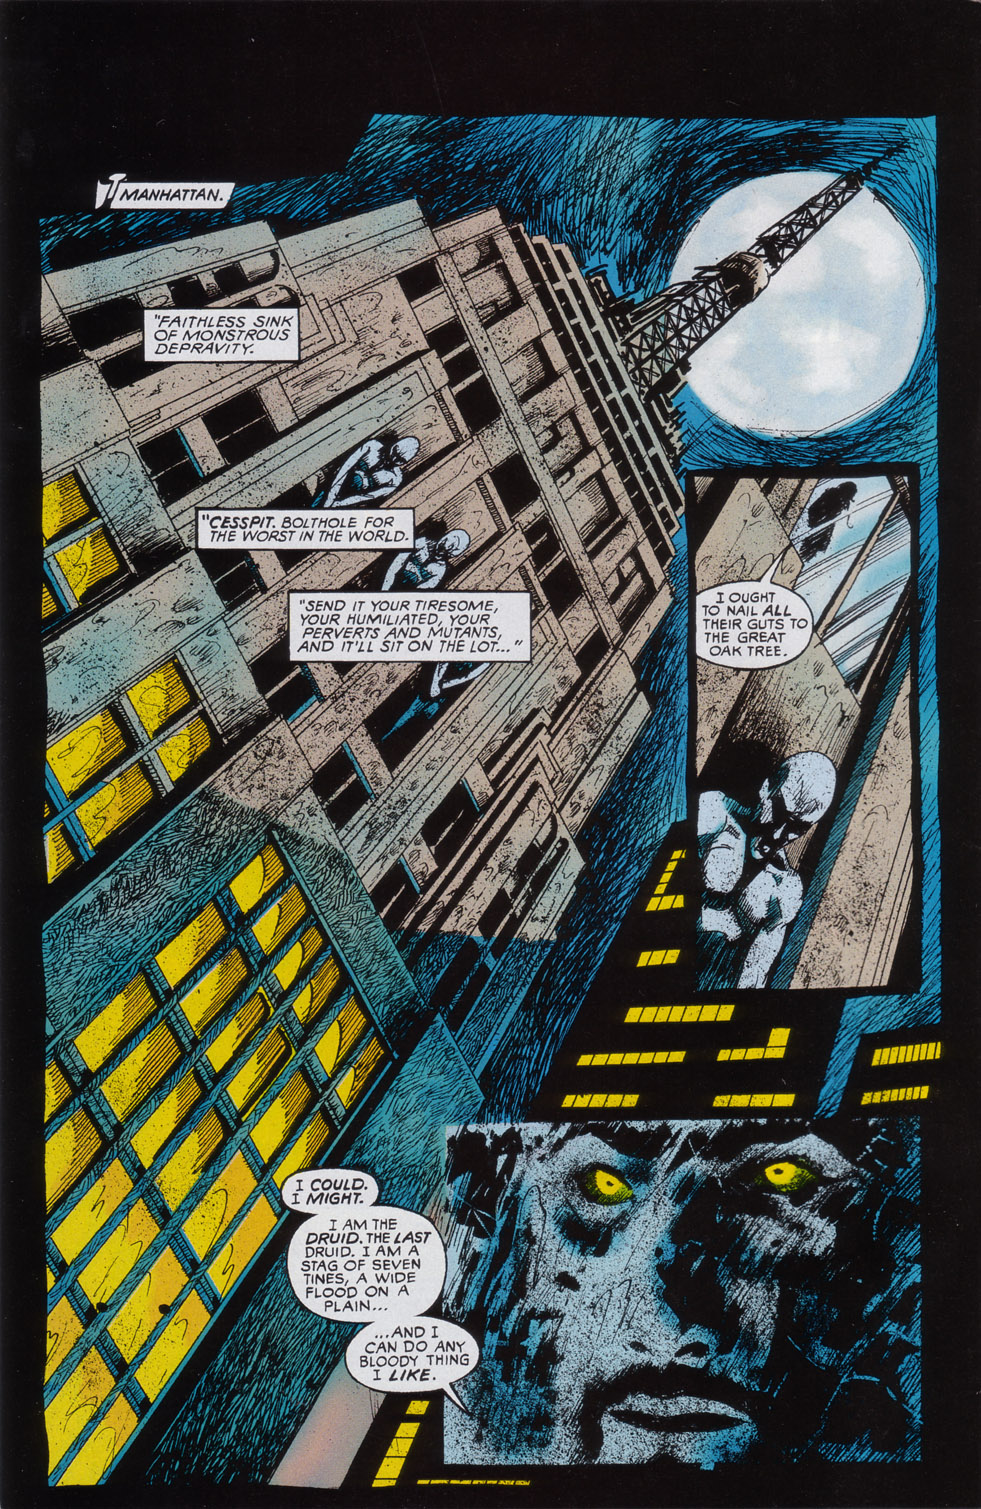 Read online Druid comic -  Issue #2 - 3